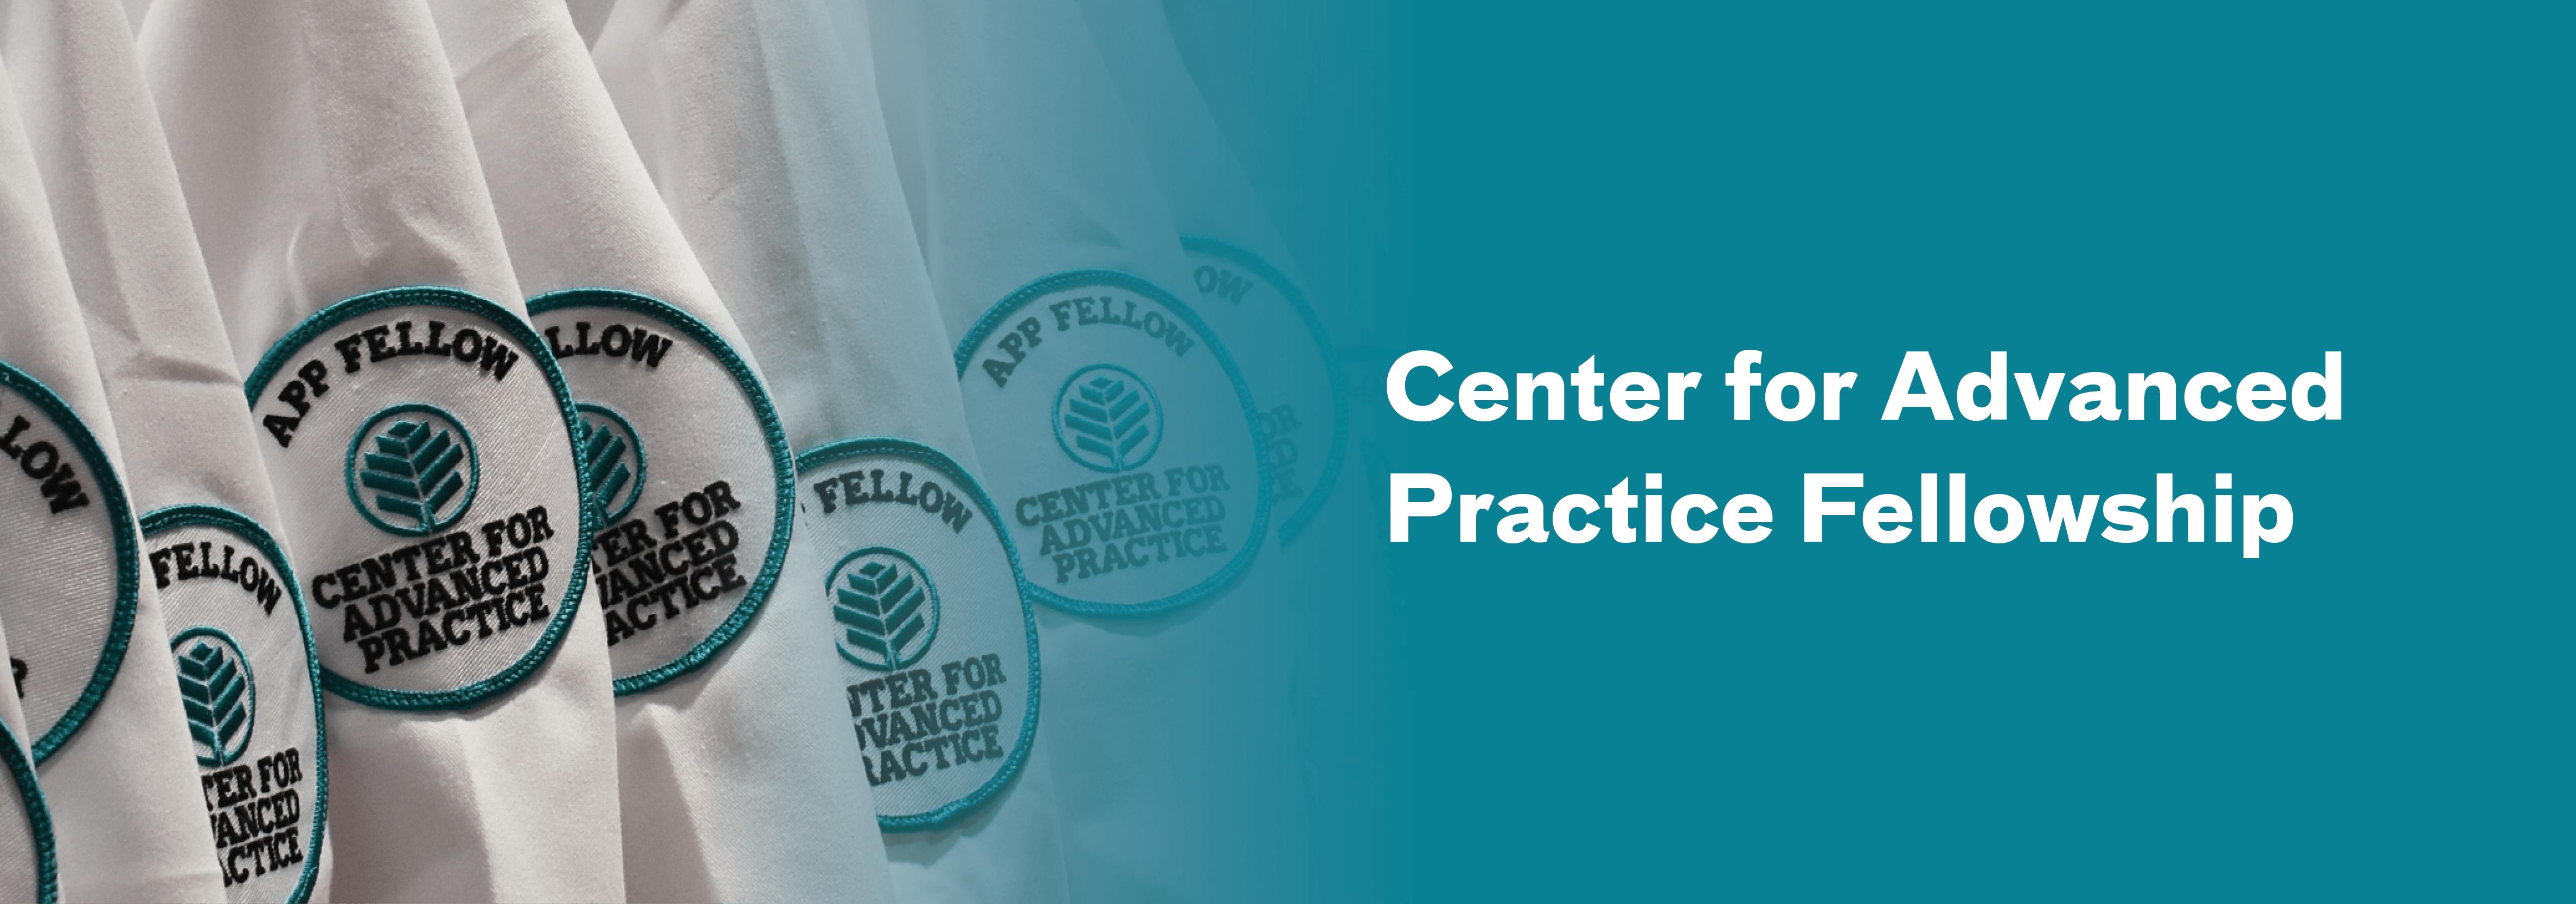 Center for Advanced Practice Fellowship